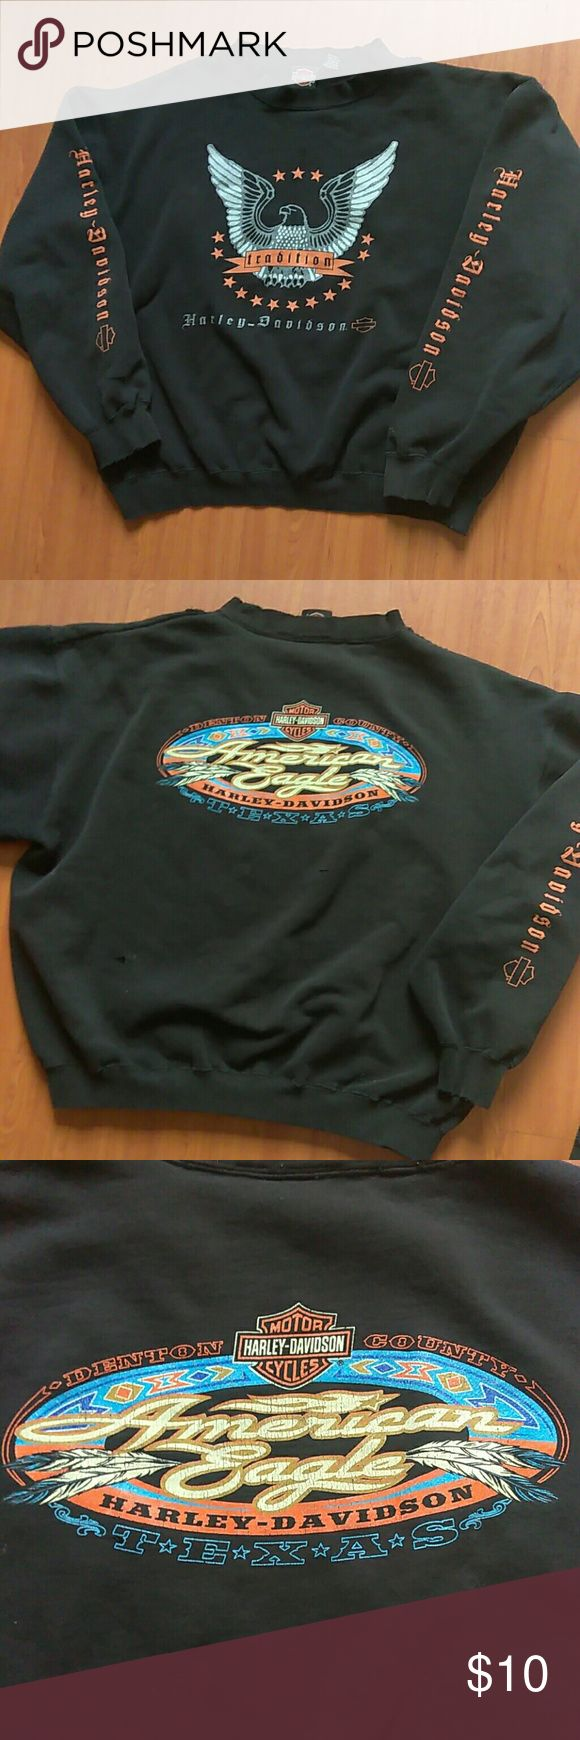 Harley Davidson sweatshirt (XL) Used slight fade and wear due to wash and wear Harley-Davidson Shirts